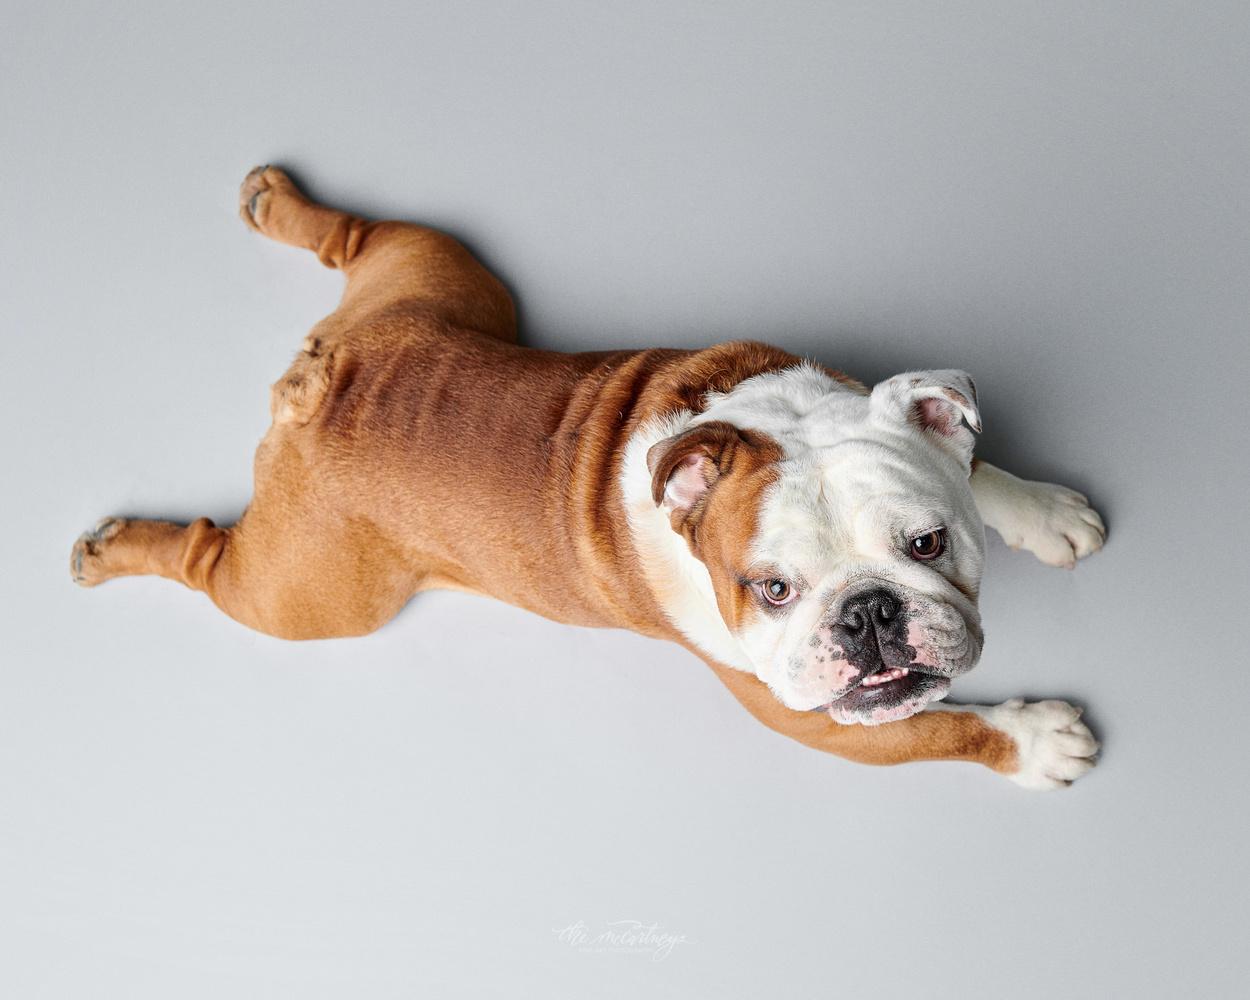 Bulldog frog pose by Butch McCartney